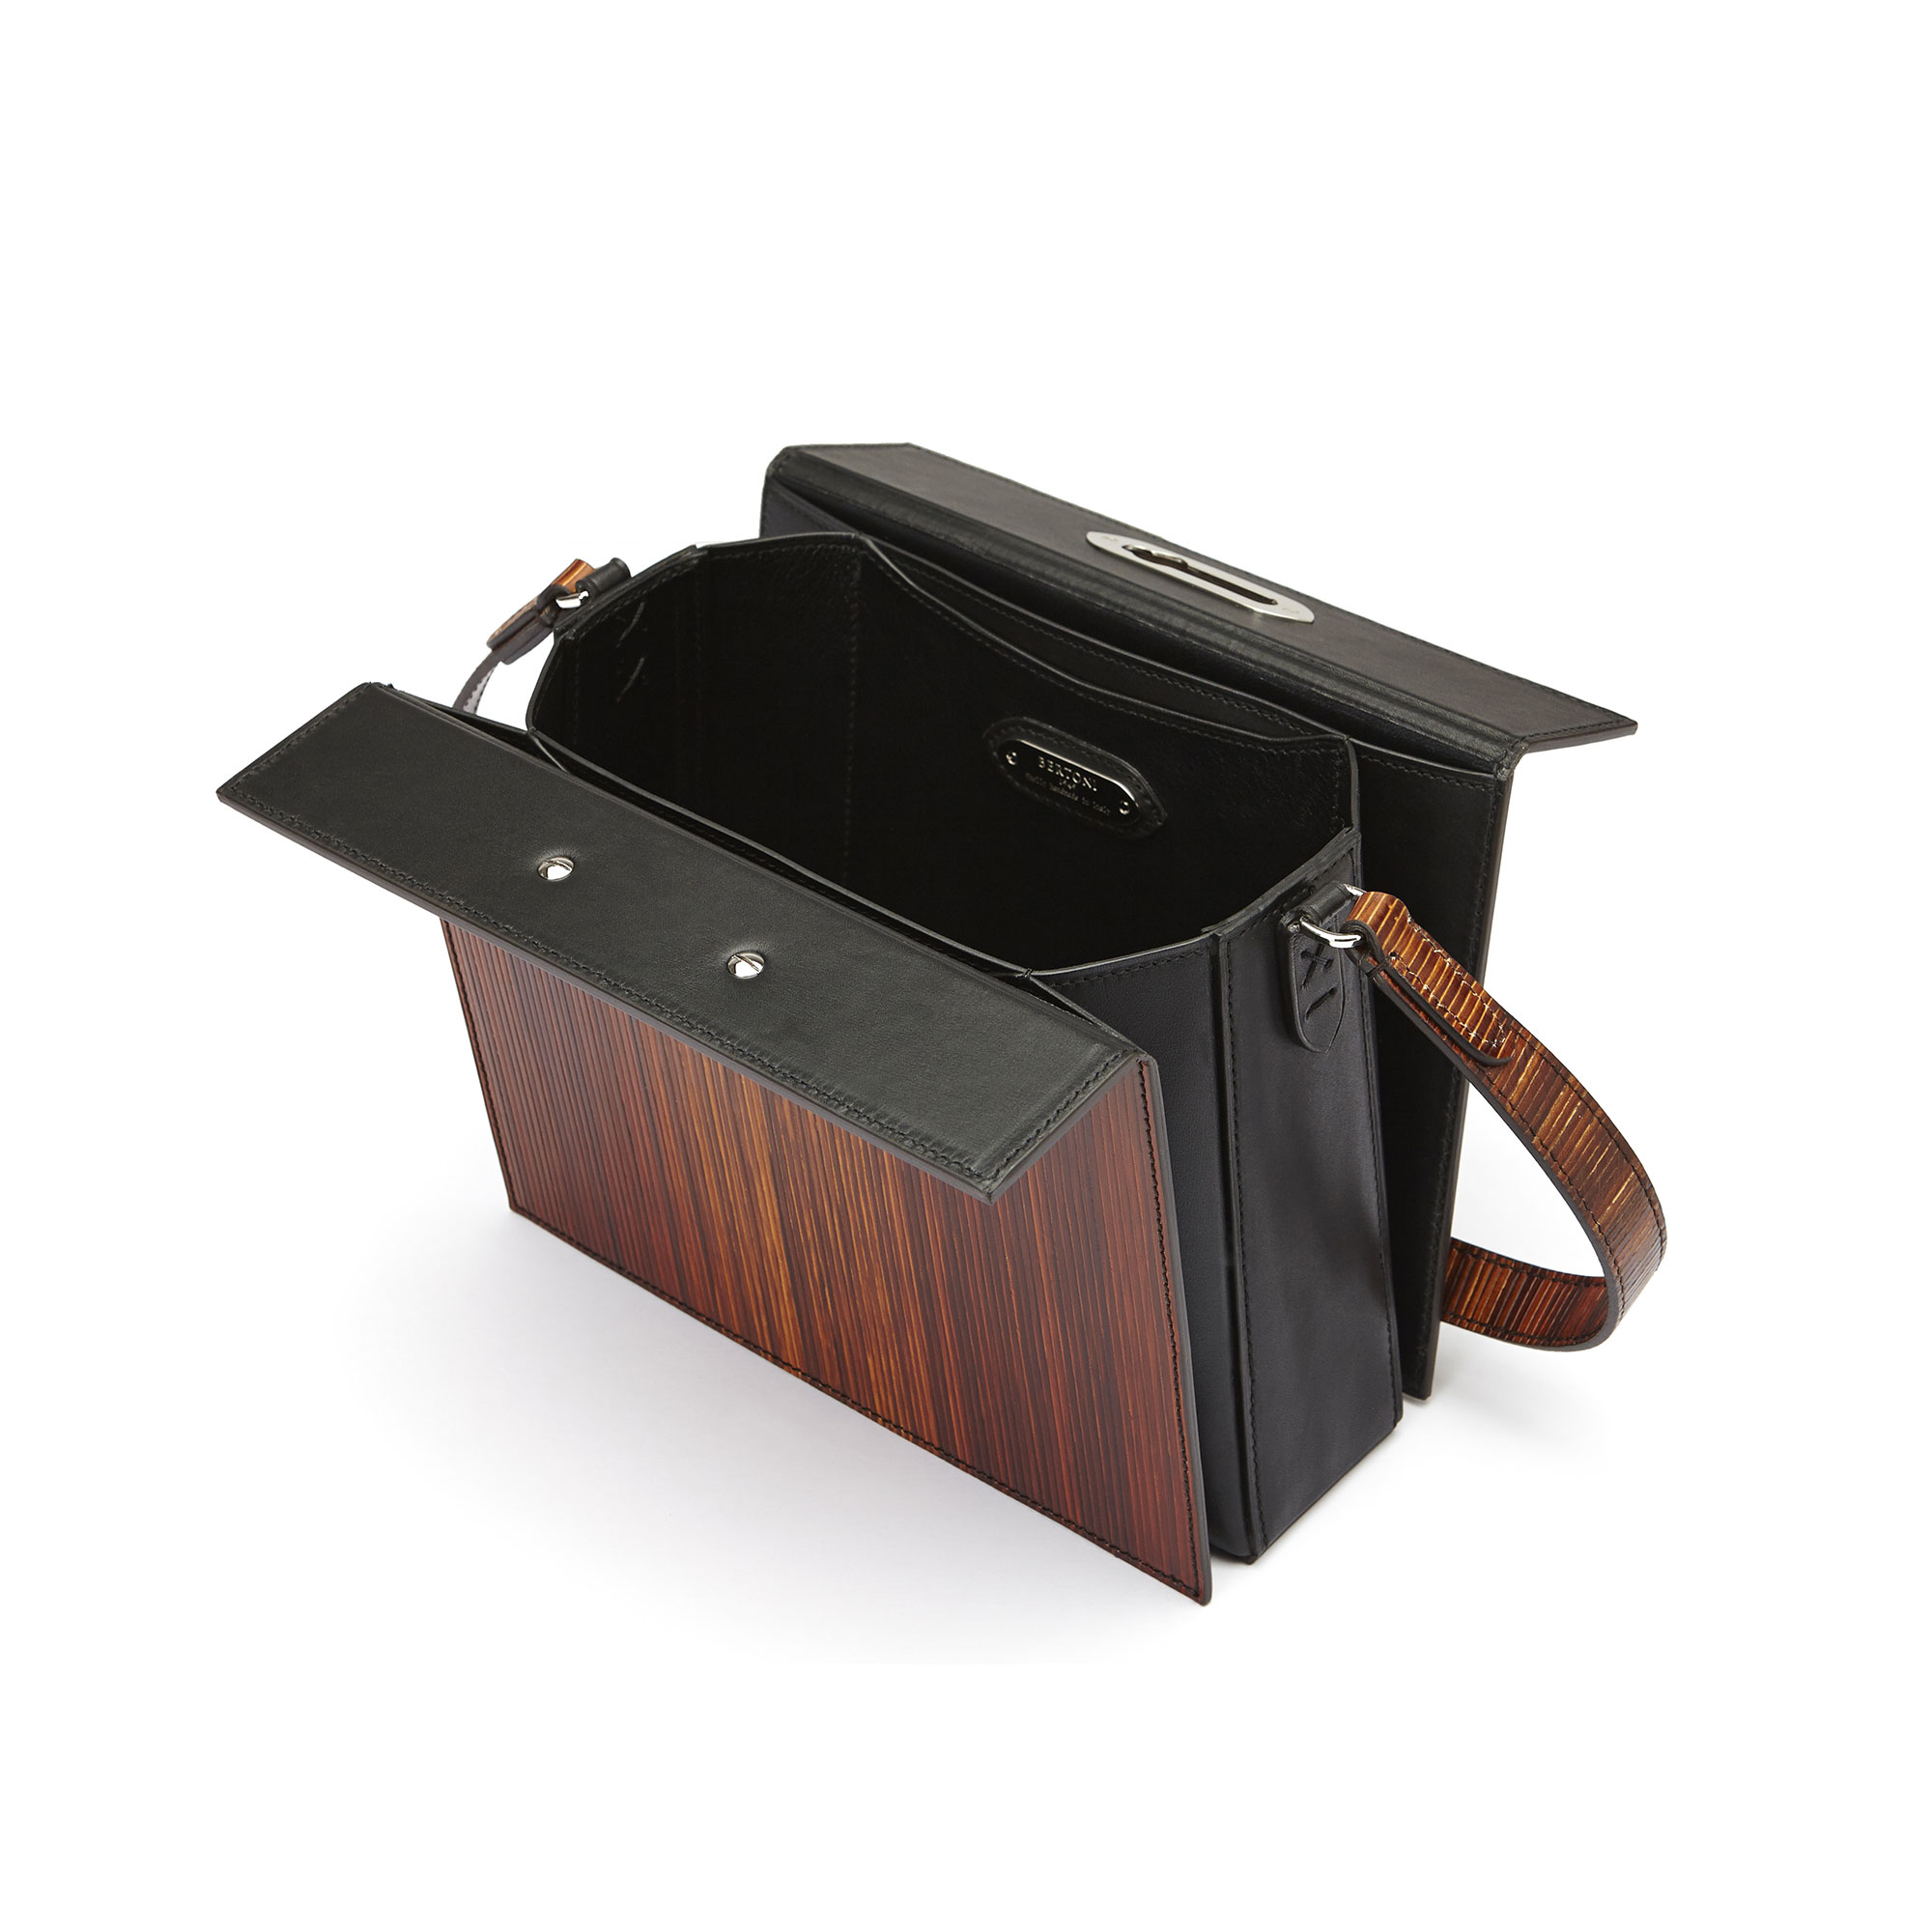 The black effect wood leather french calf Gemma Crossbody bag by Bertoni 1949 03